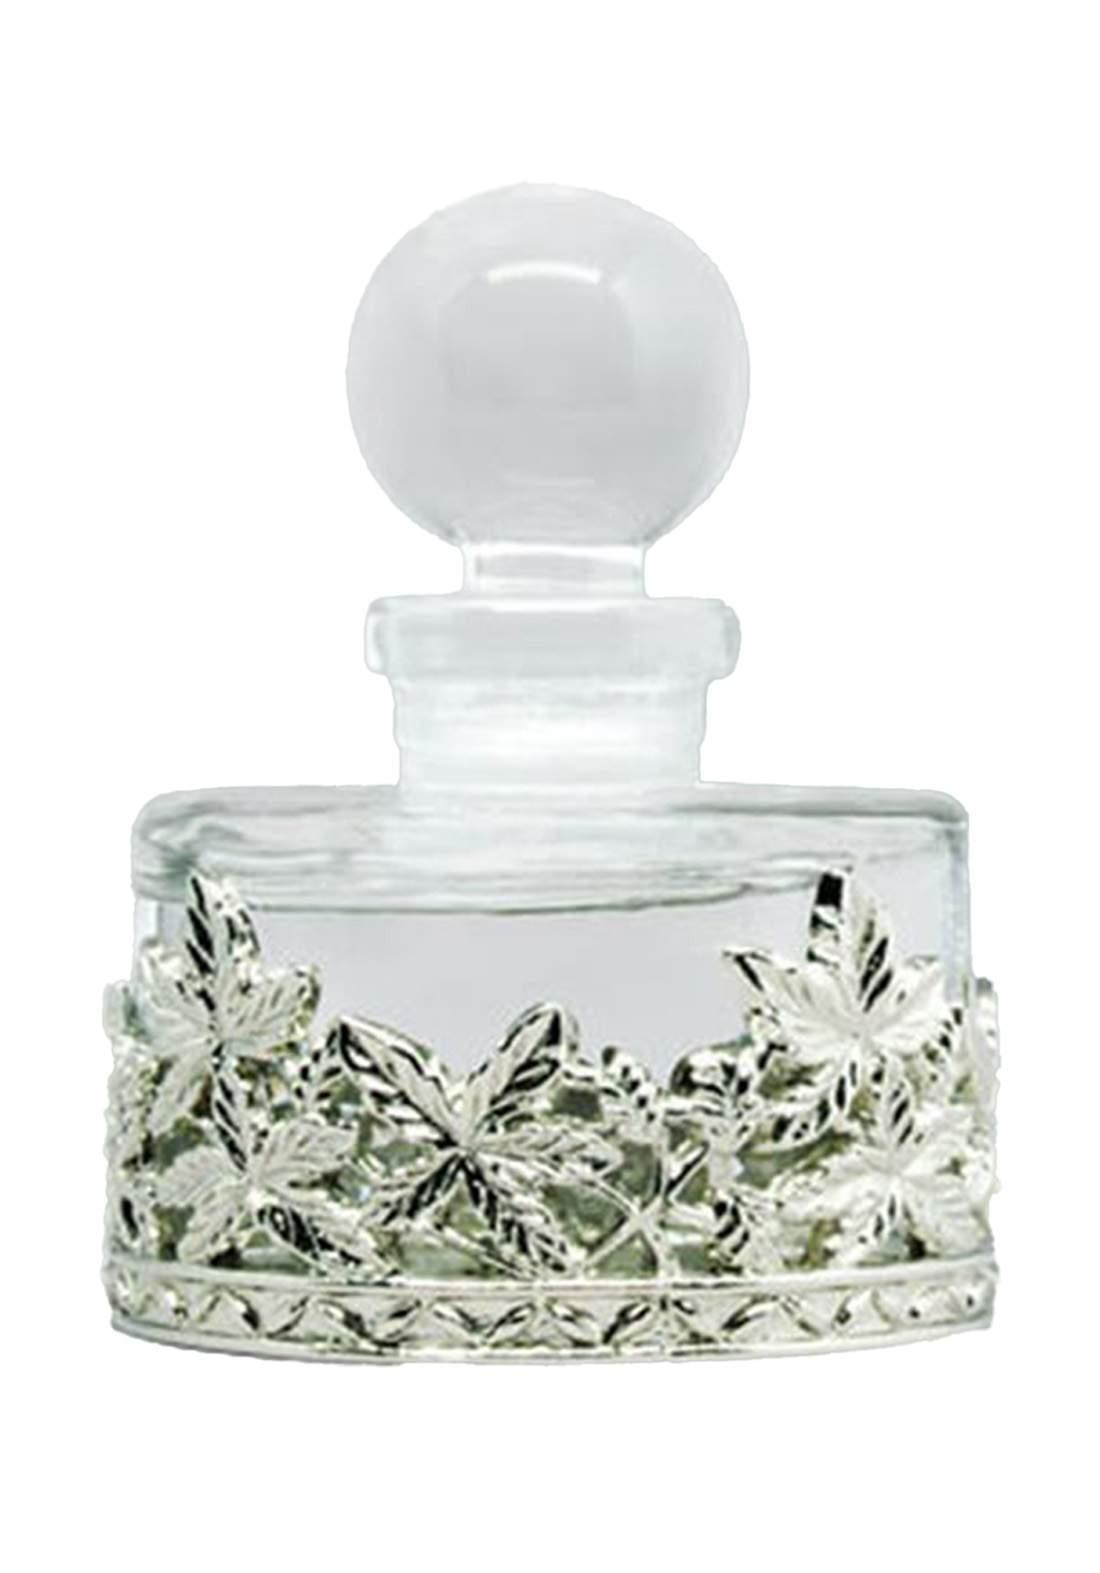 Swiss Arabian 207 Musk Malaki Perfume Oil Unisex 30 ml  عطر زيتي  لكلا الجنسين